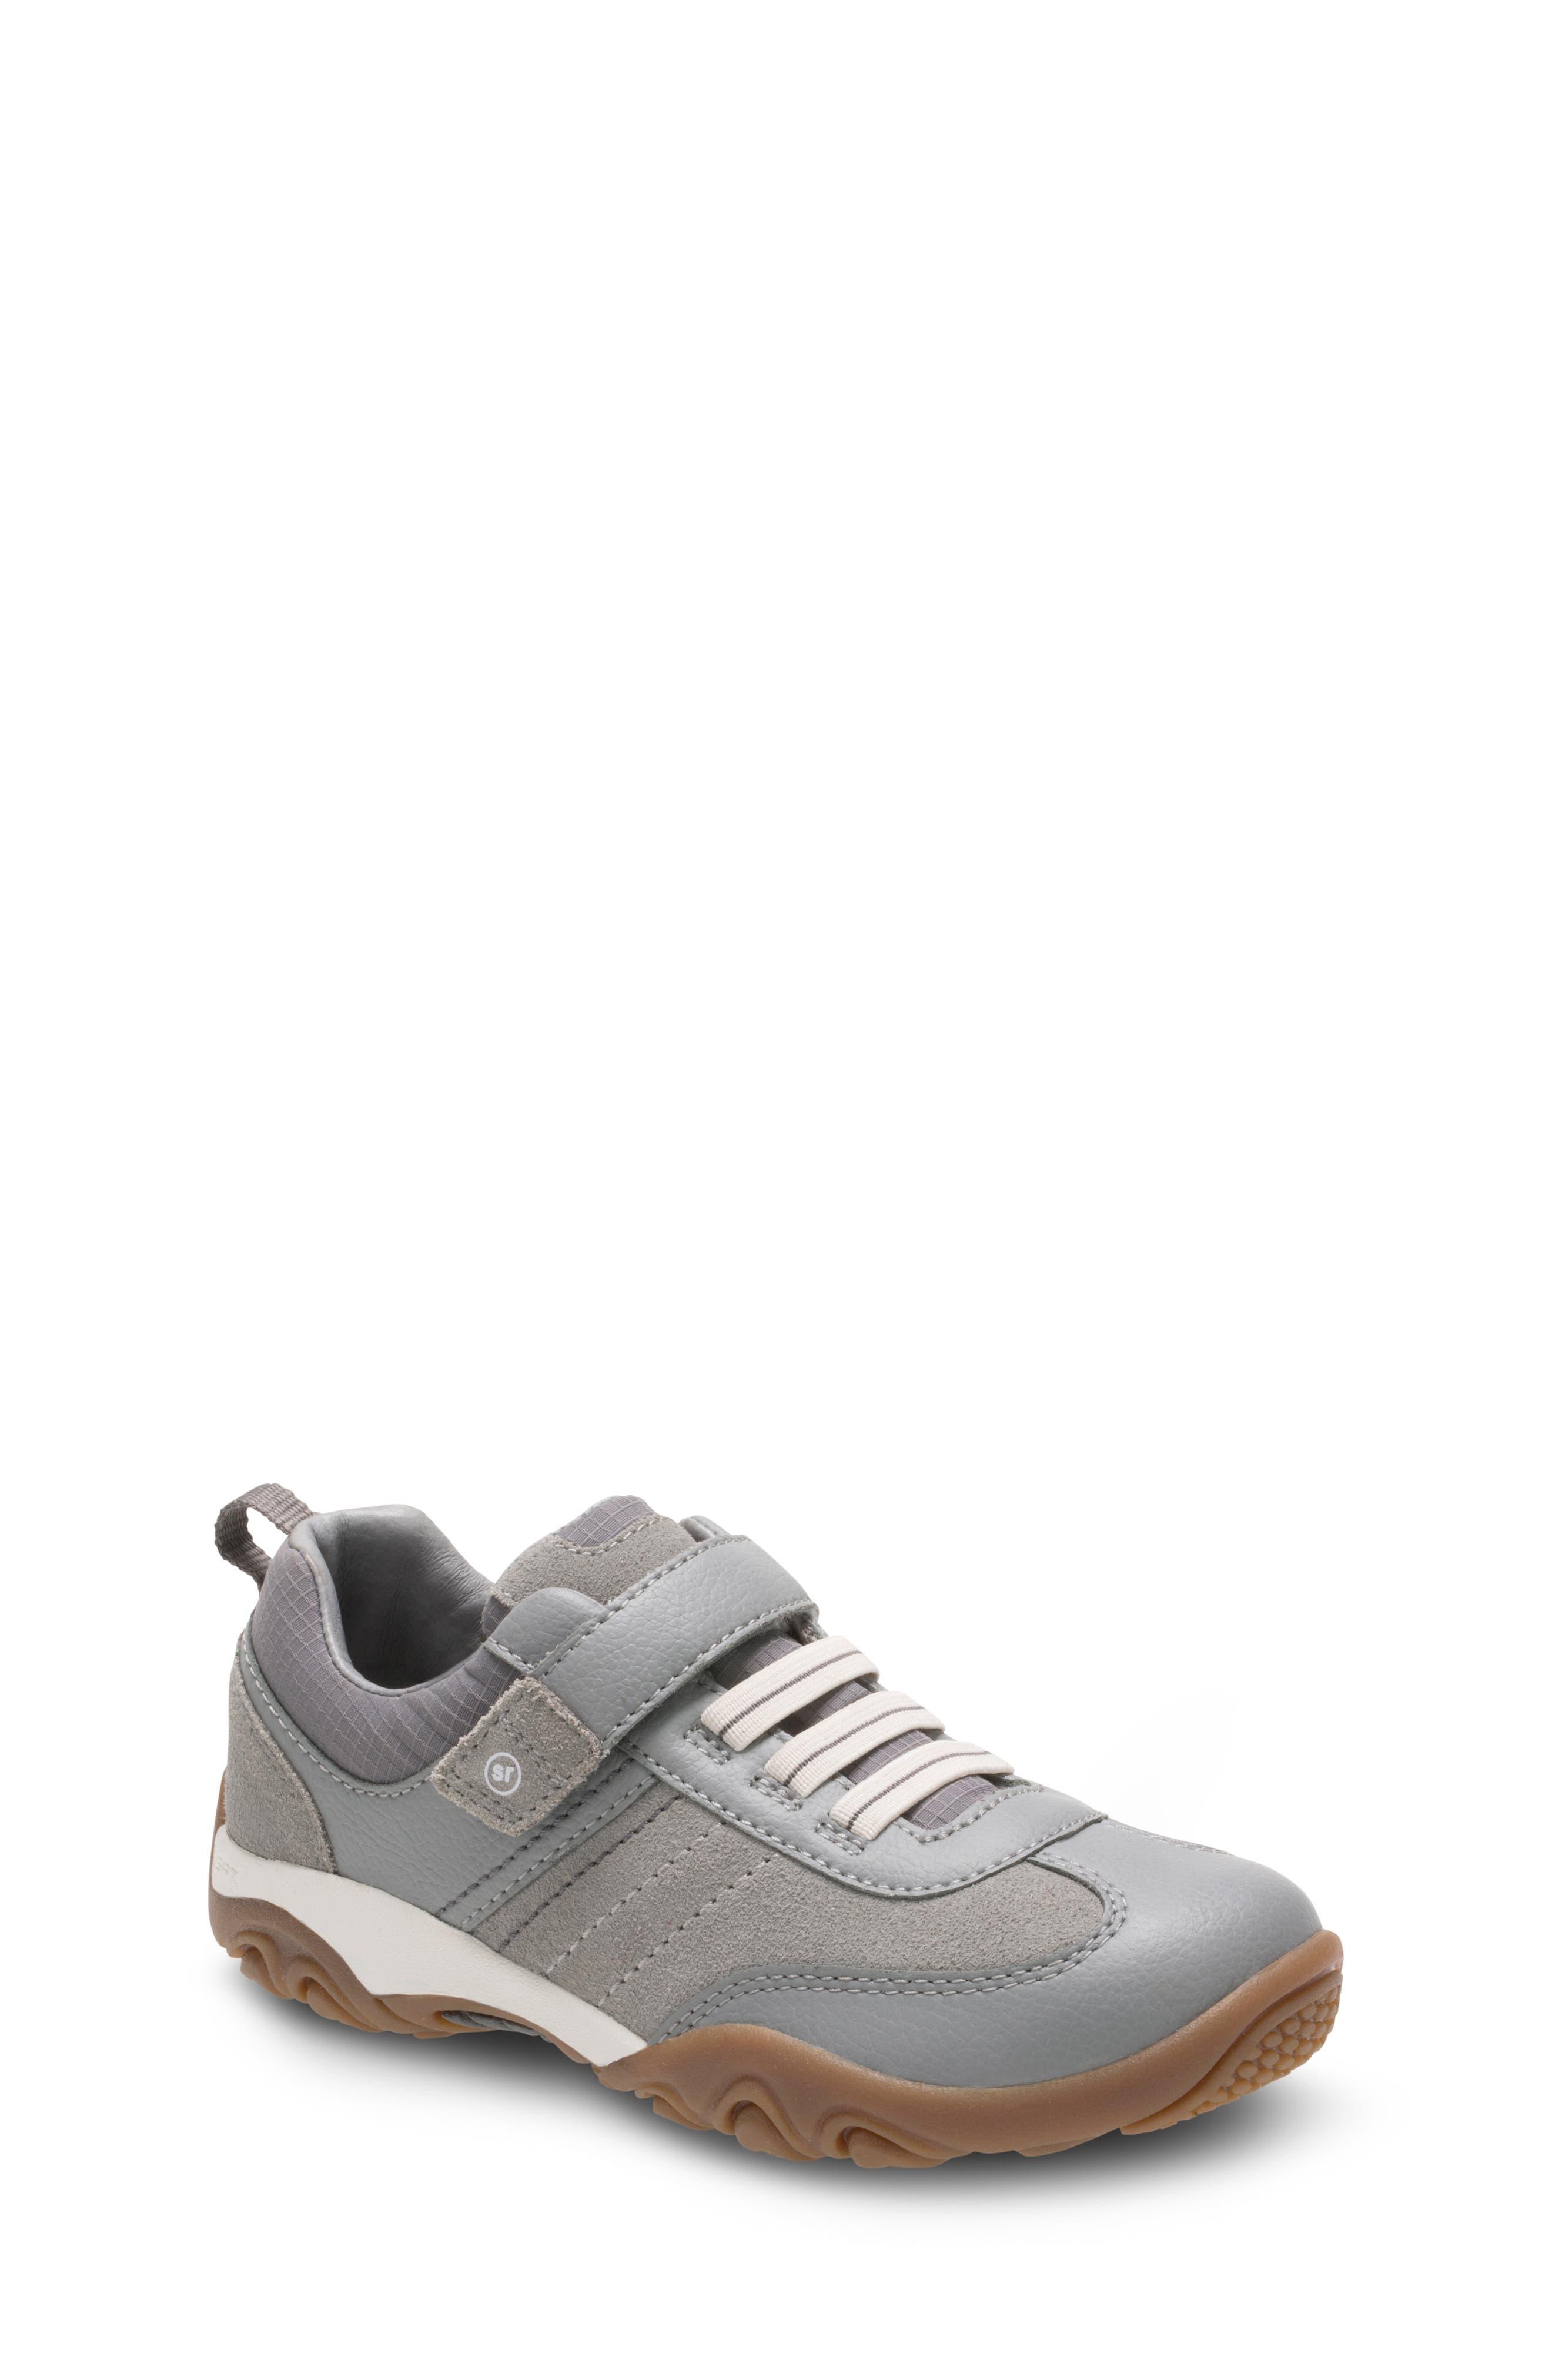 Prescott Sneaker,                         Main,                         color, GREY